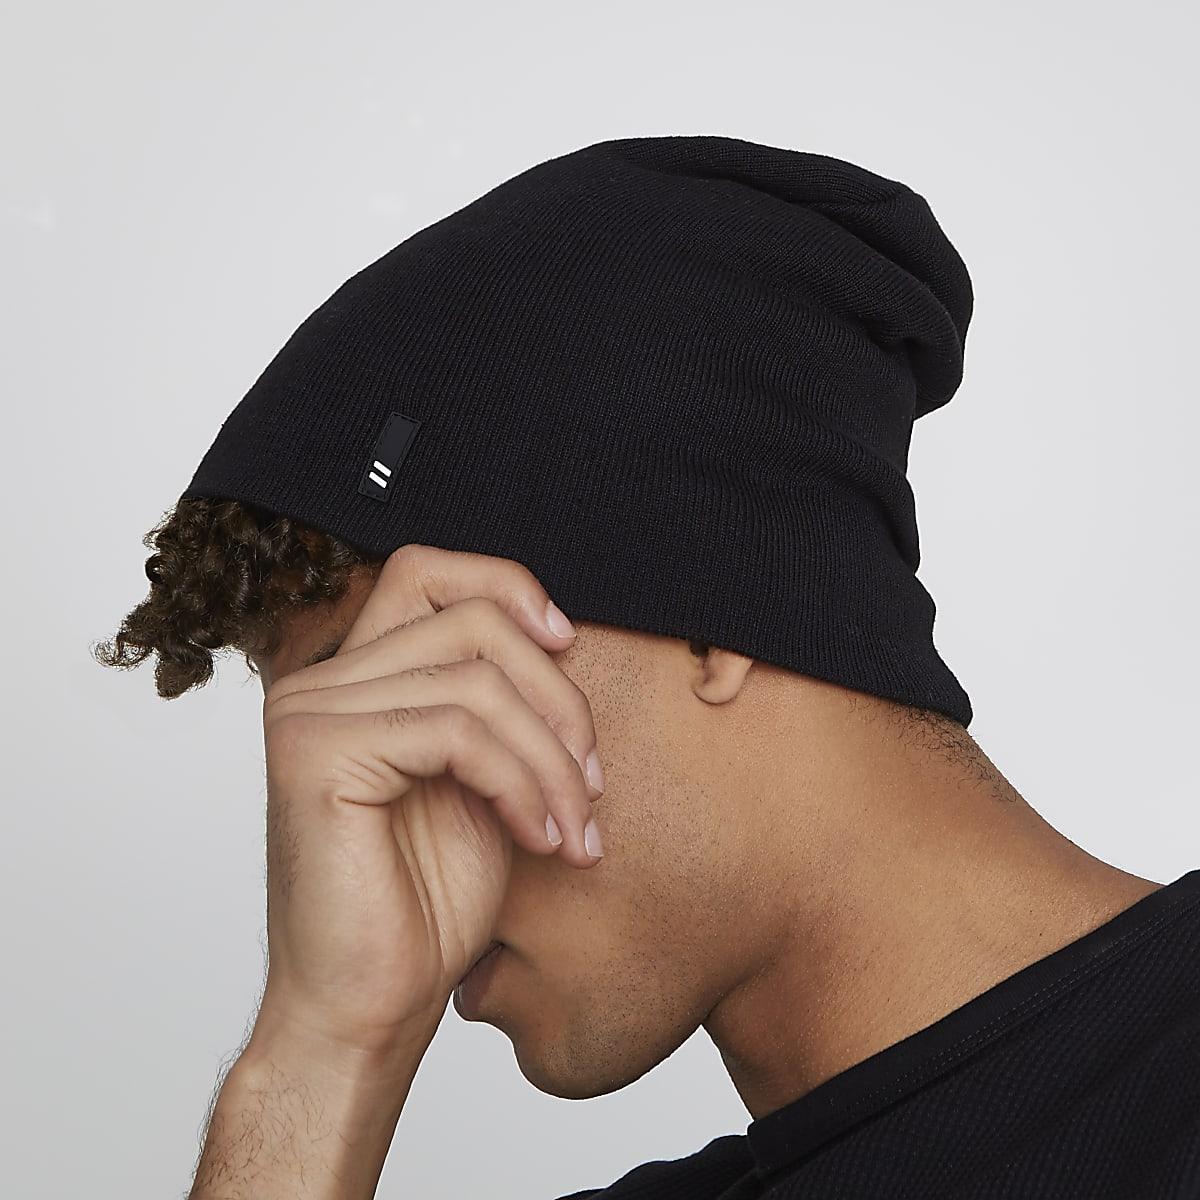 74aee0a74fb Black slouchy beanie hat - Hats   Caps - Accessories - men